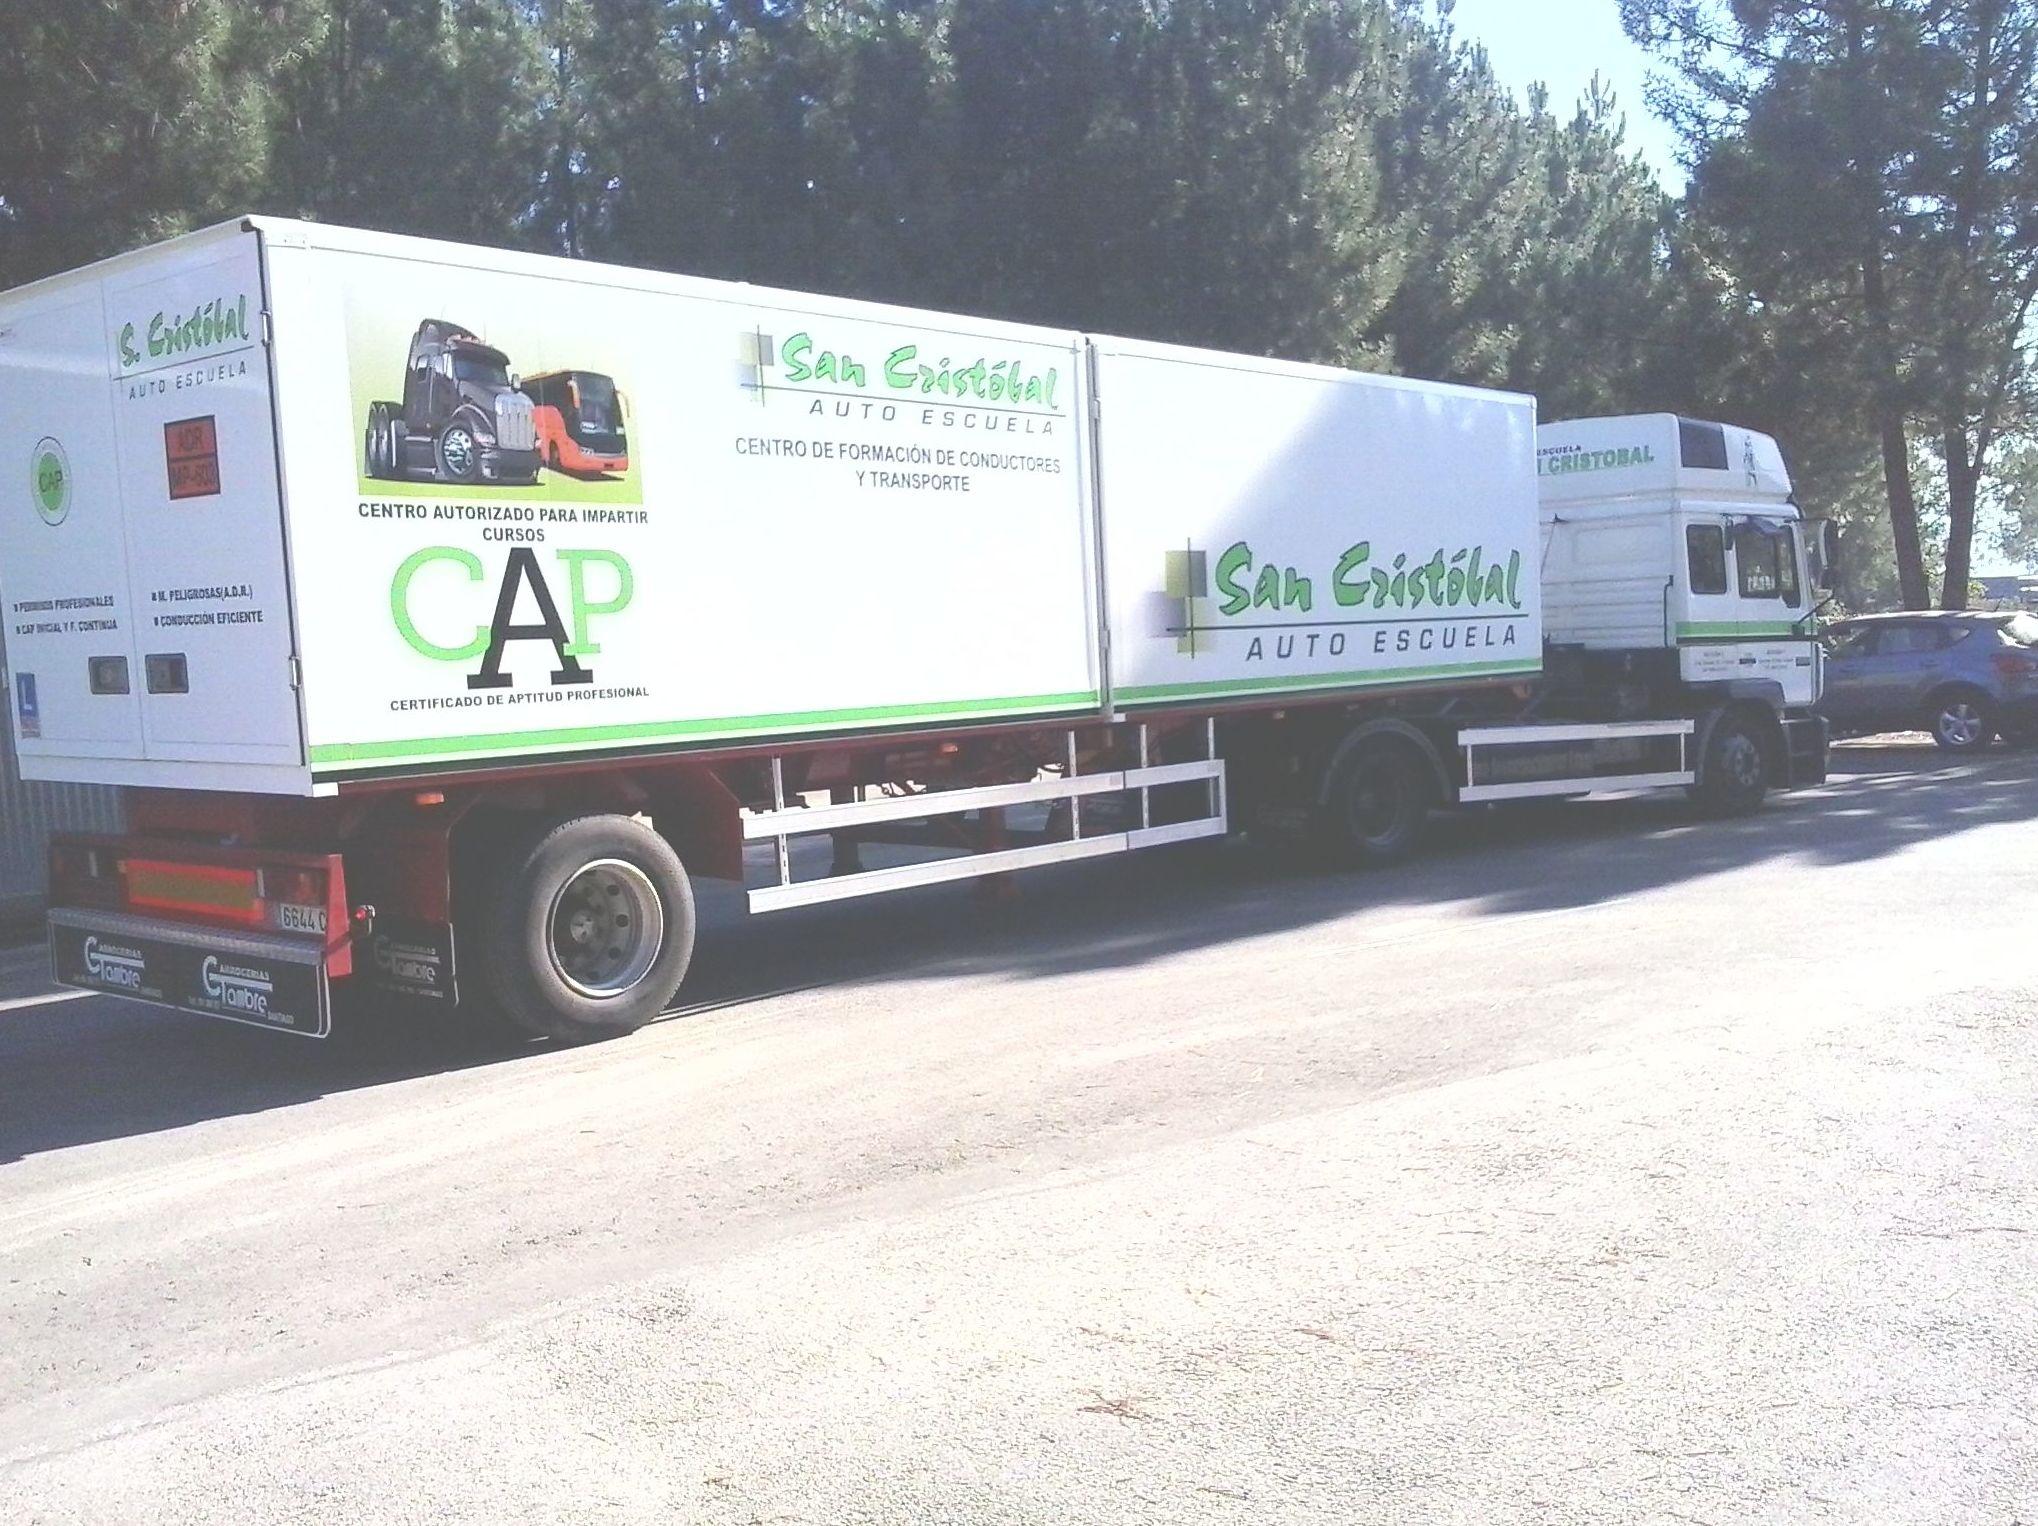 Picture 6 of Autoescuela in Ourense | Autoescuela San Cristóbal